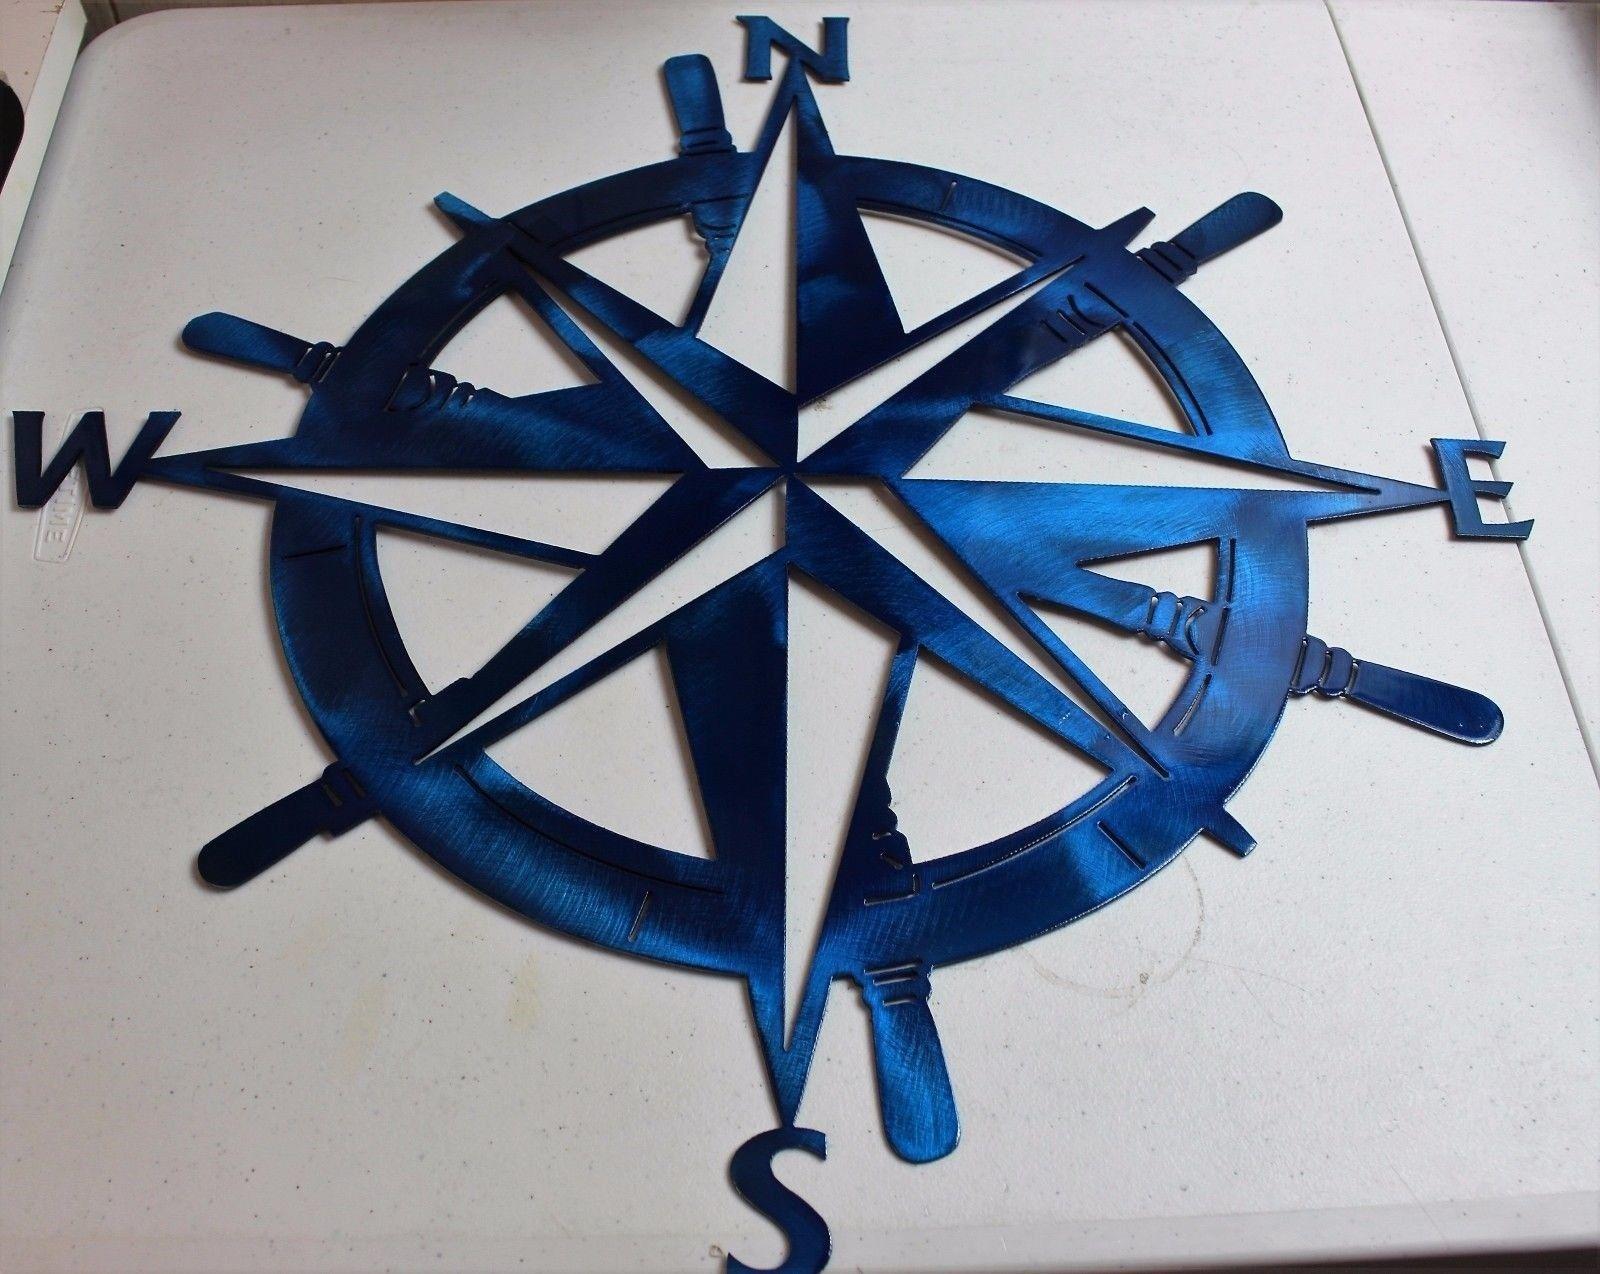 "Nautical COMPASS ROSE  WALL ART DECOR  15/"" Small version copper//bronze plated"